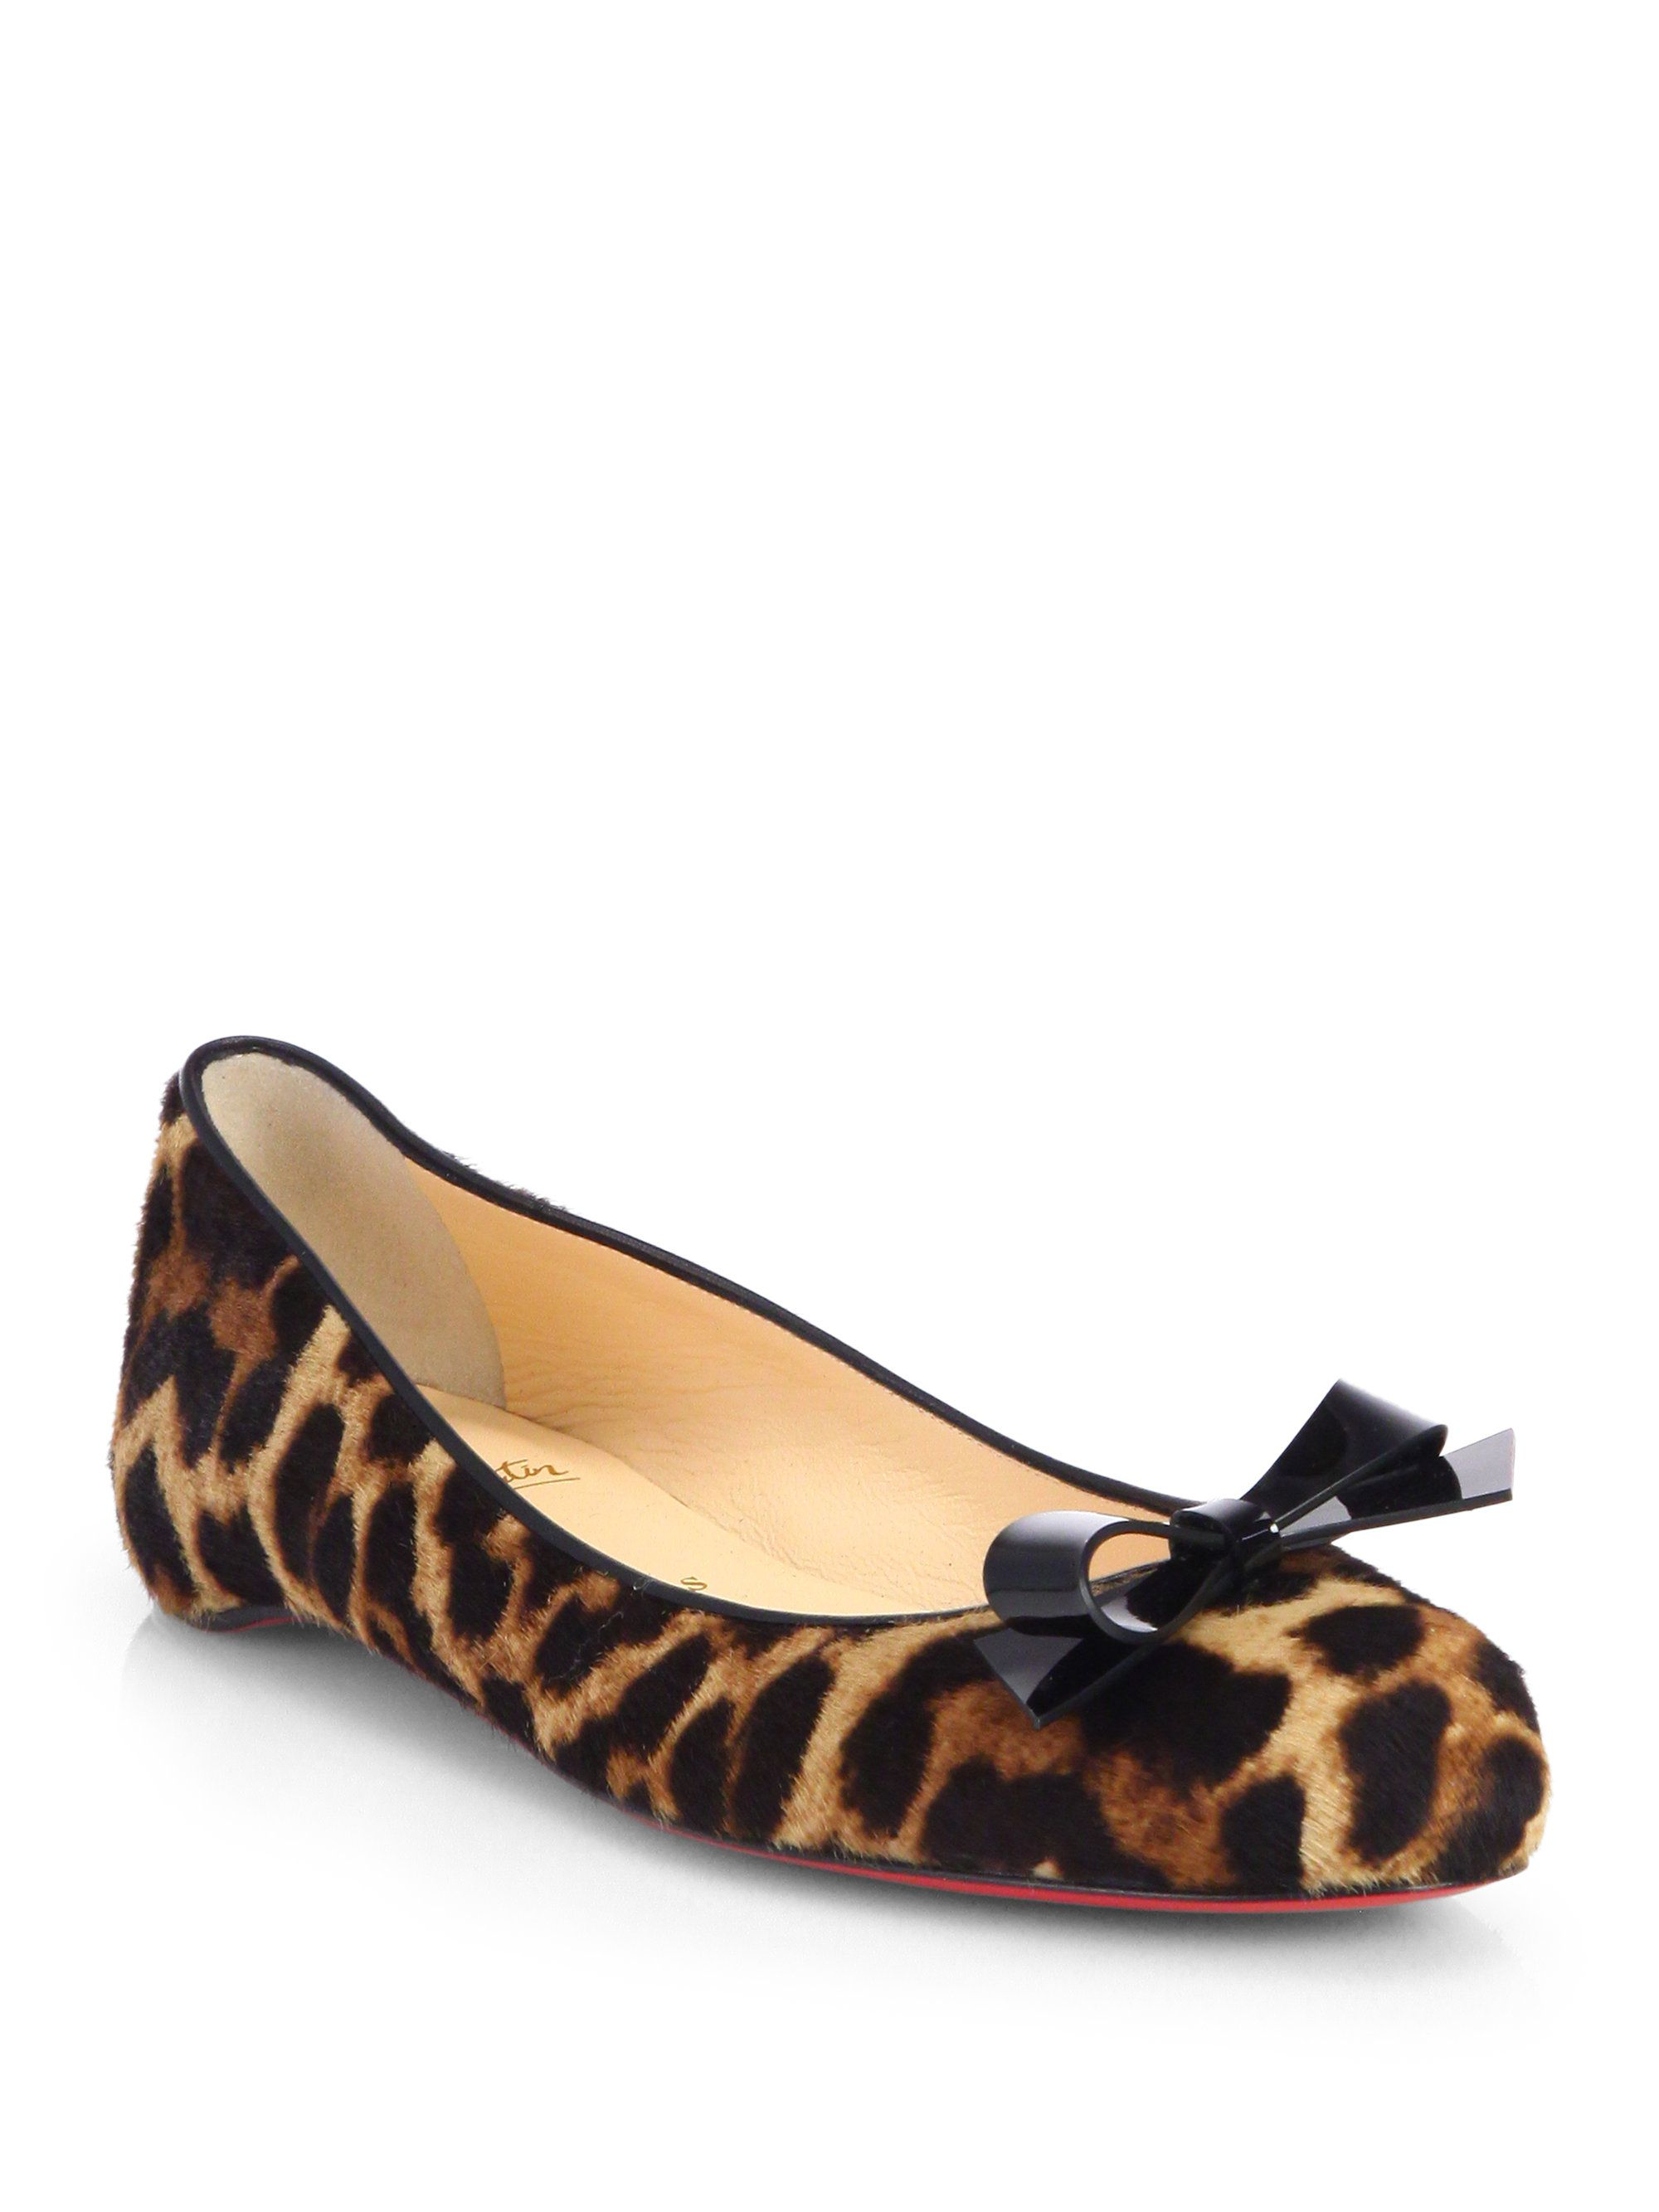 new style 2cd71 241f9 Women's Simplenodo Leopard-Print Calf Hair Ballet Flats ...